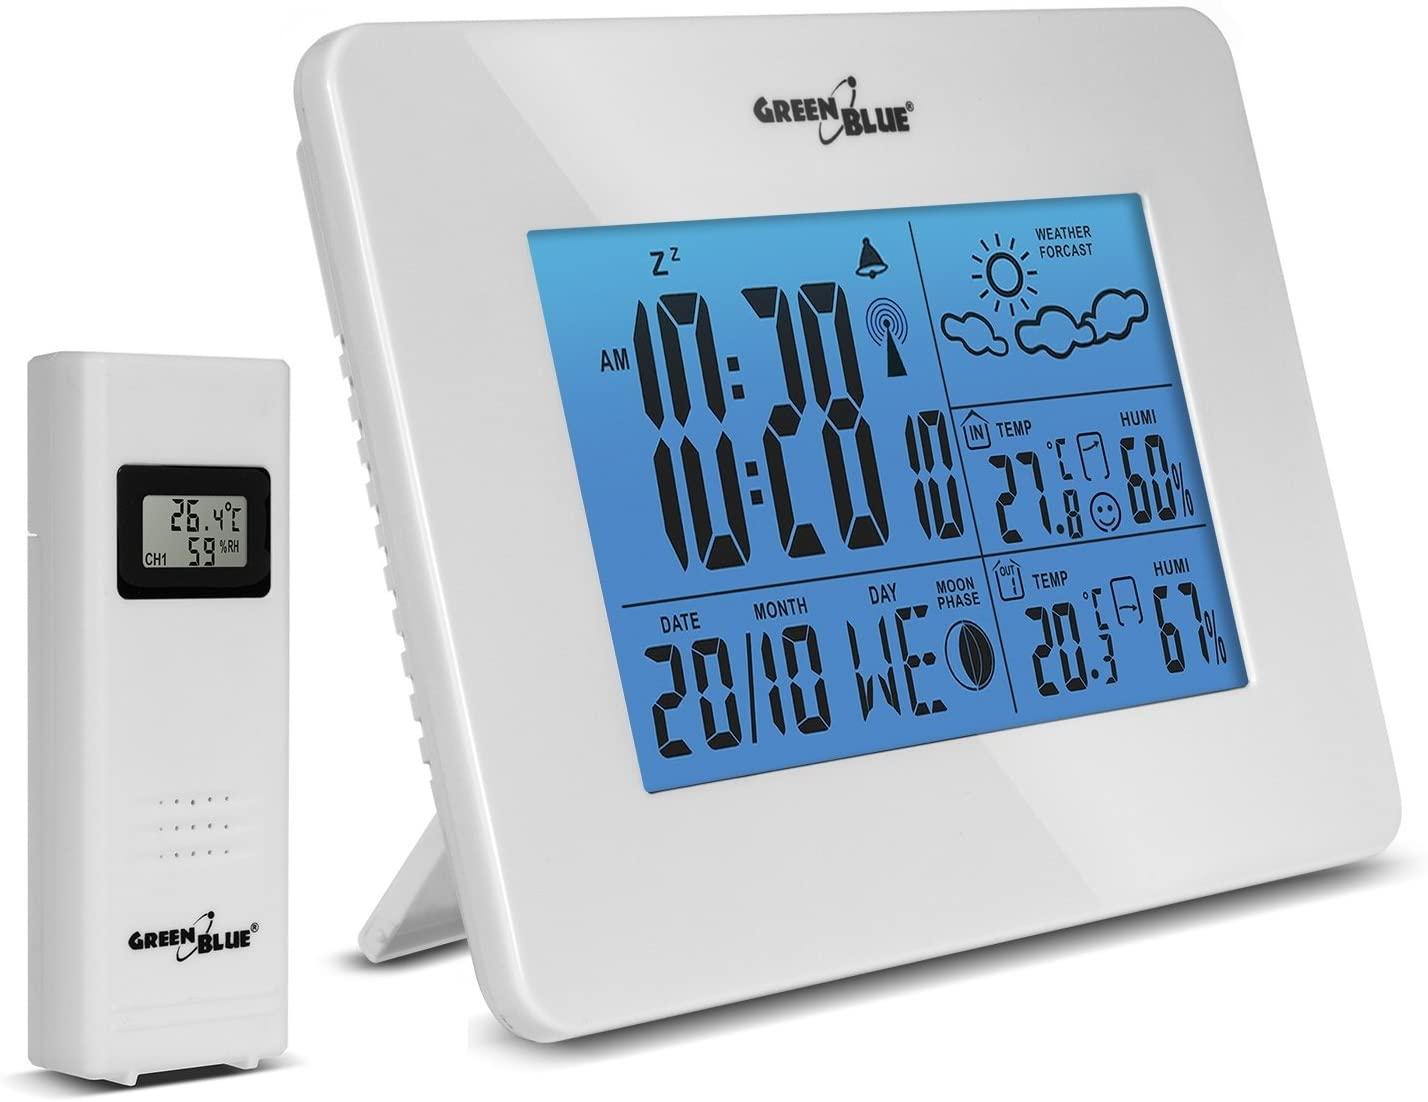 GB146 - Estación meteorológica inalámbrica, Sensor Externo Pantalla LCD DCF Fases Lunares, Disponible en Dos Colores: Blanco o Negro. (Blanco)